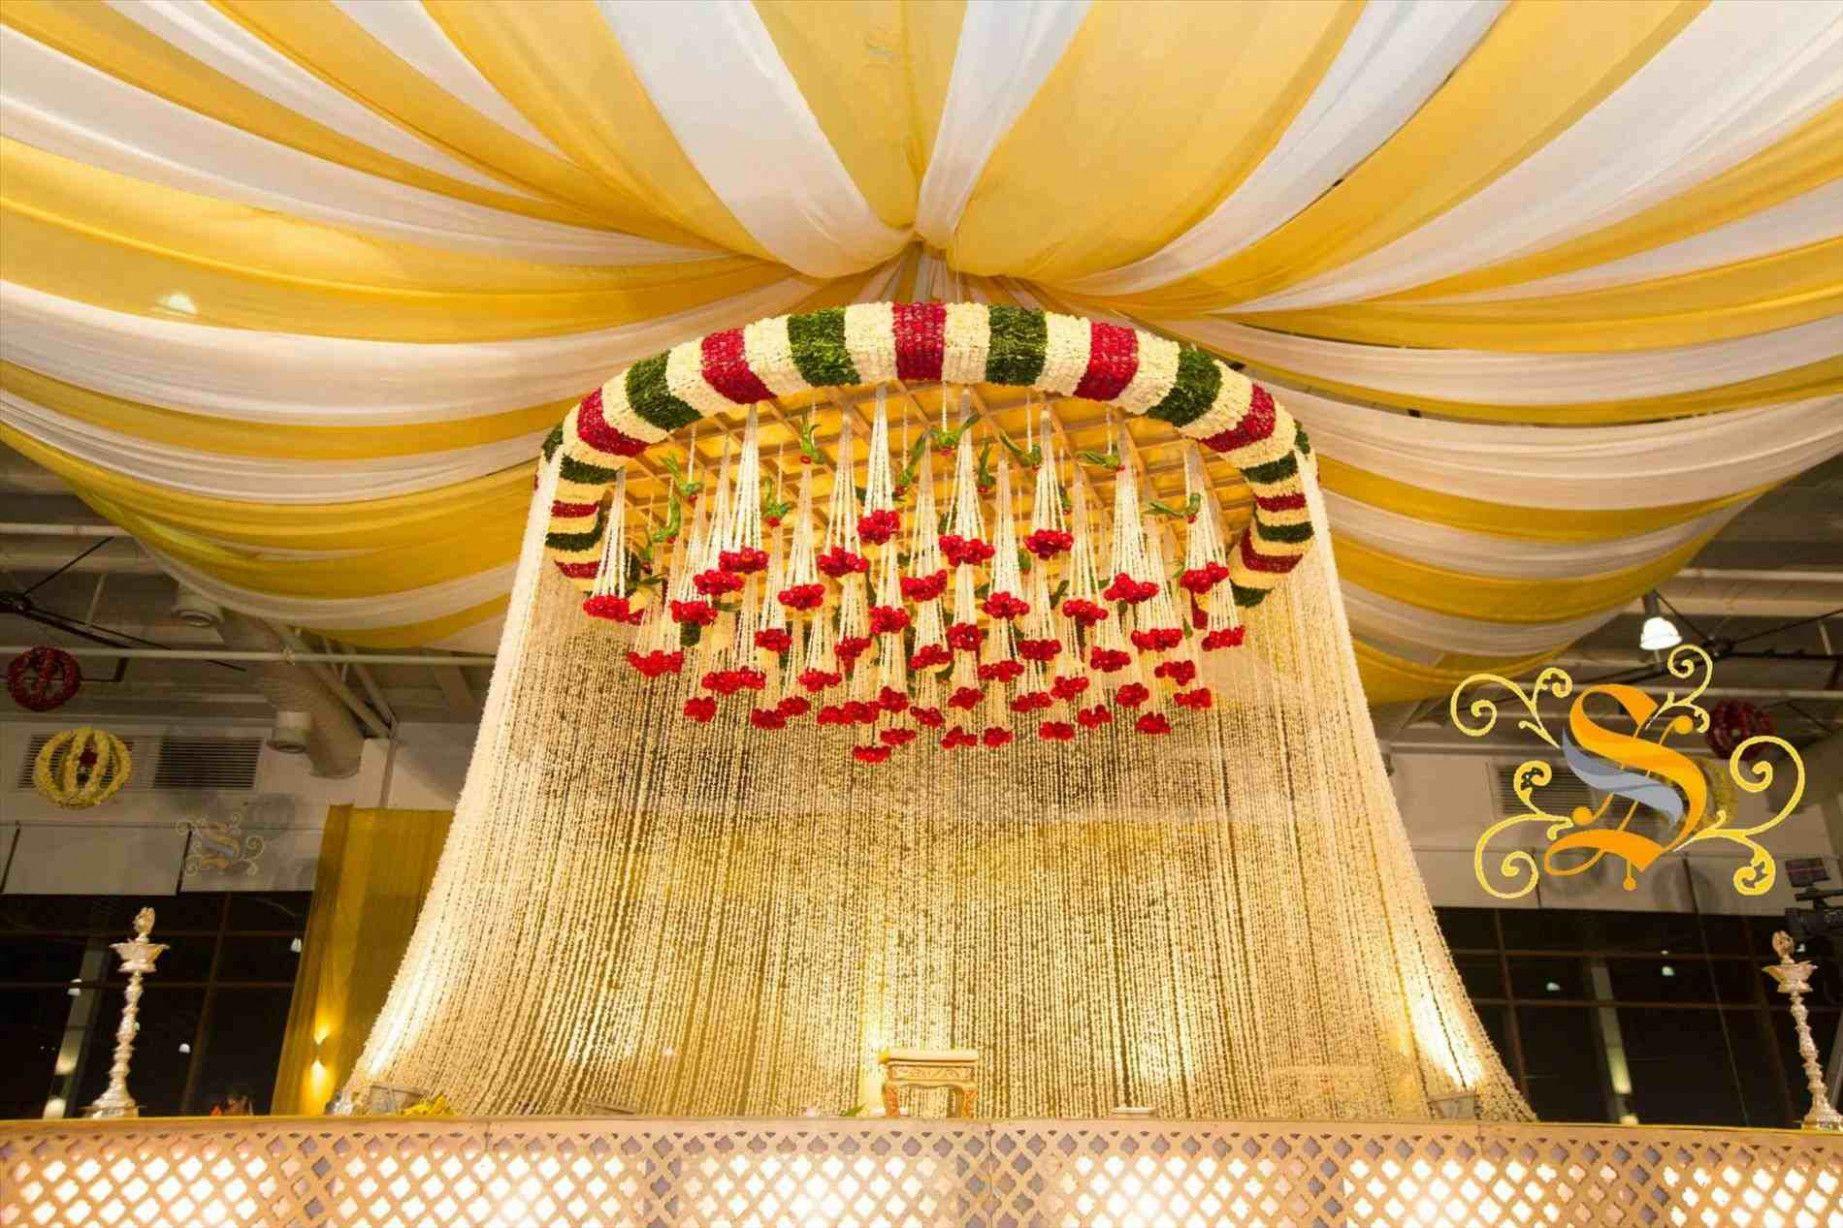 South Indian Wedding Decoration Ideas: South Indian Wedding Mandap Decor